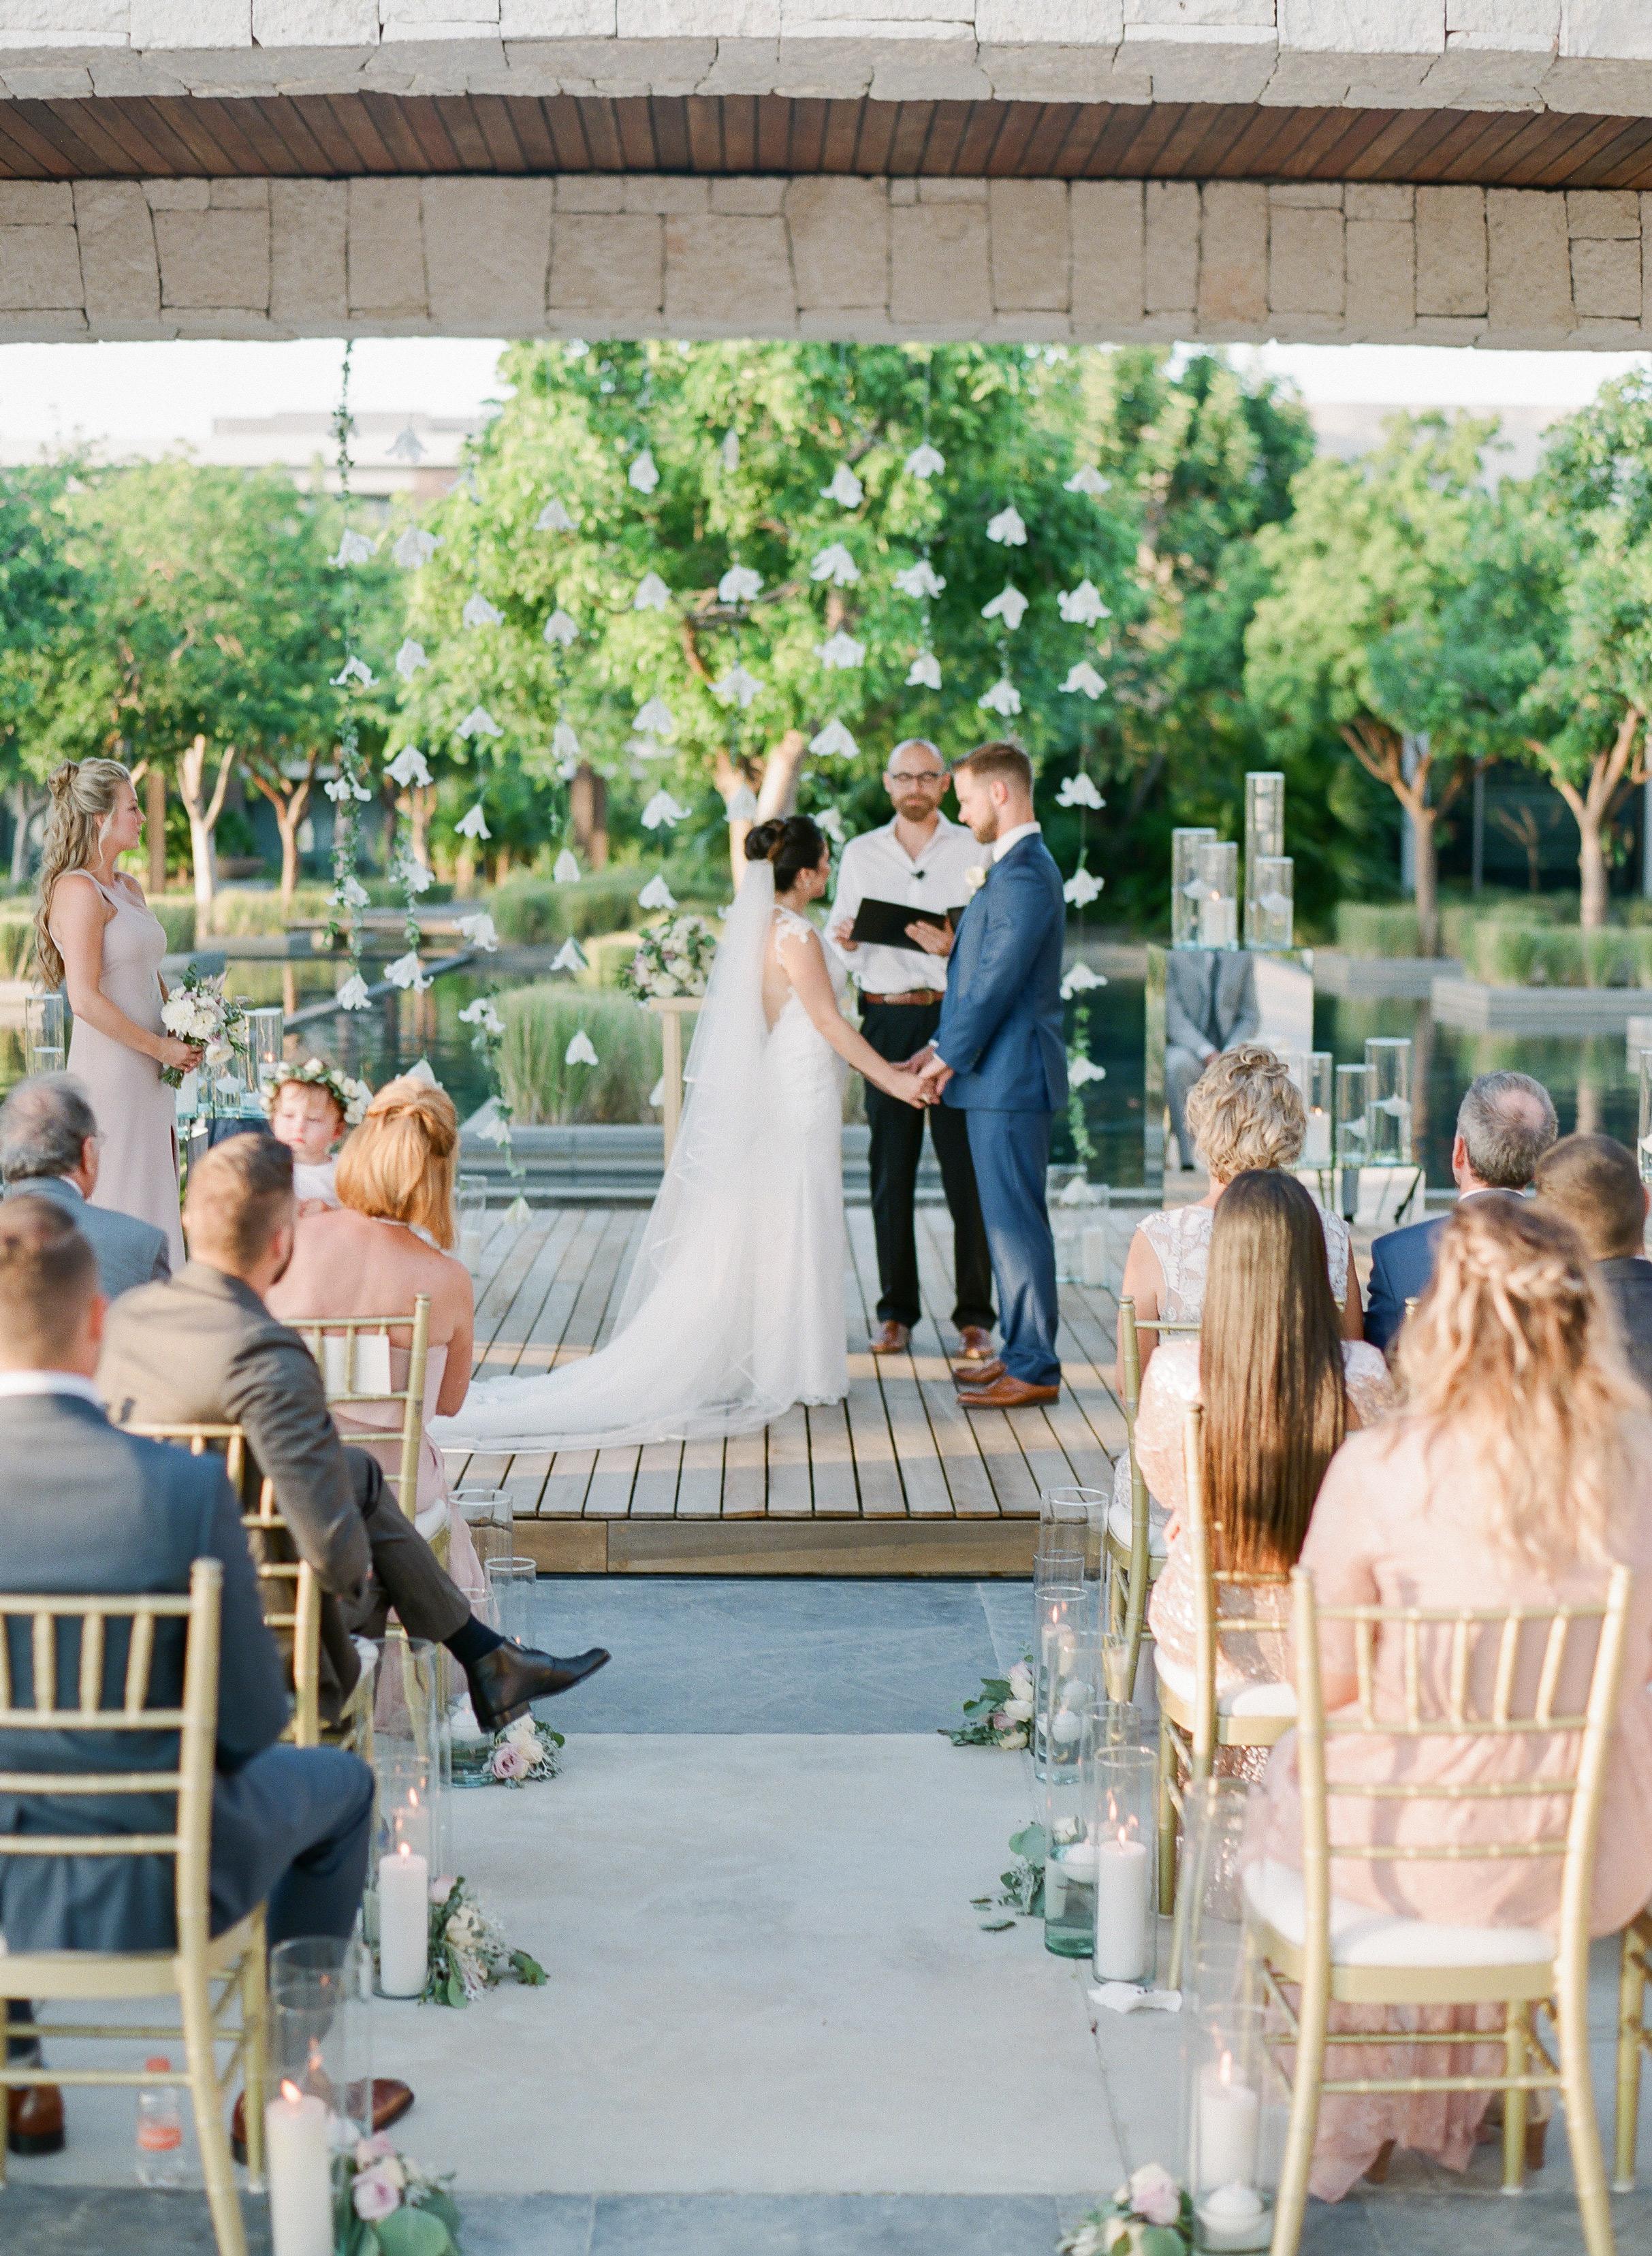 vicky james mexico wedding bride groom ceremony stage